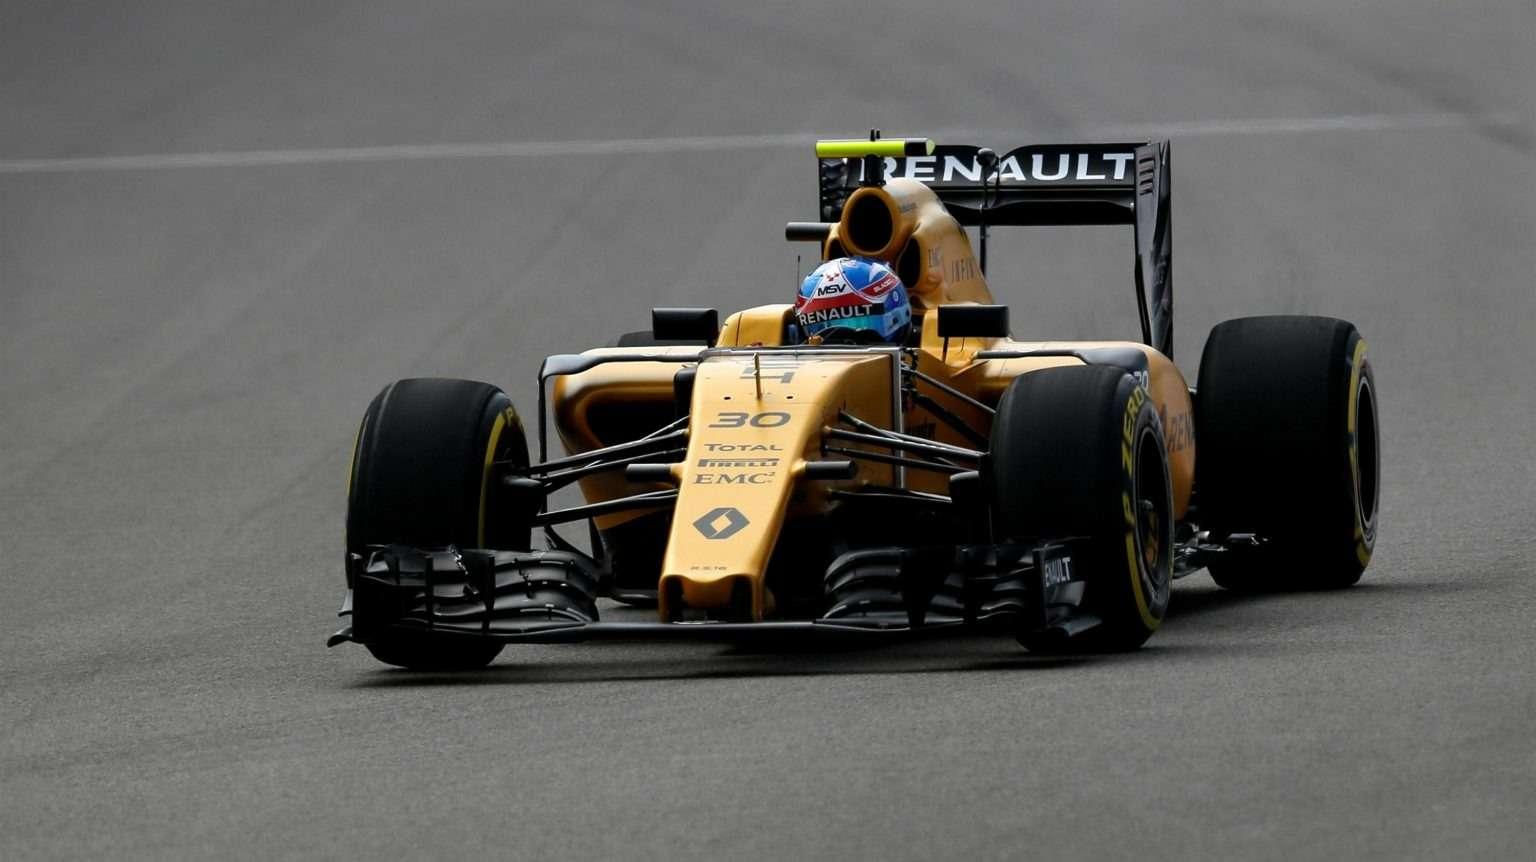 Renault, Формула 1, Сочи Автодром, Сочи, Гран При России